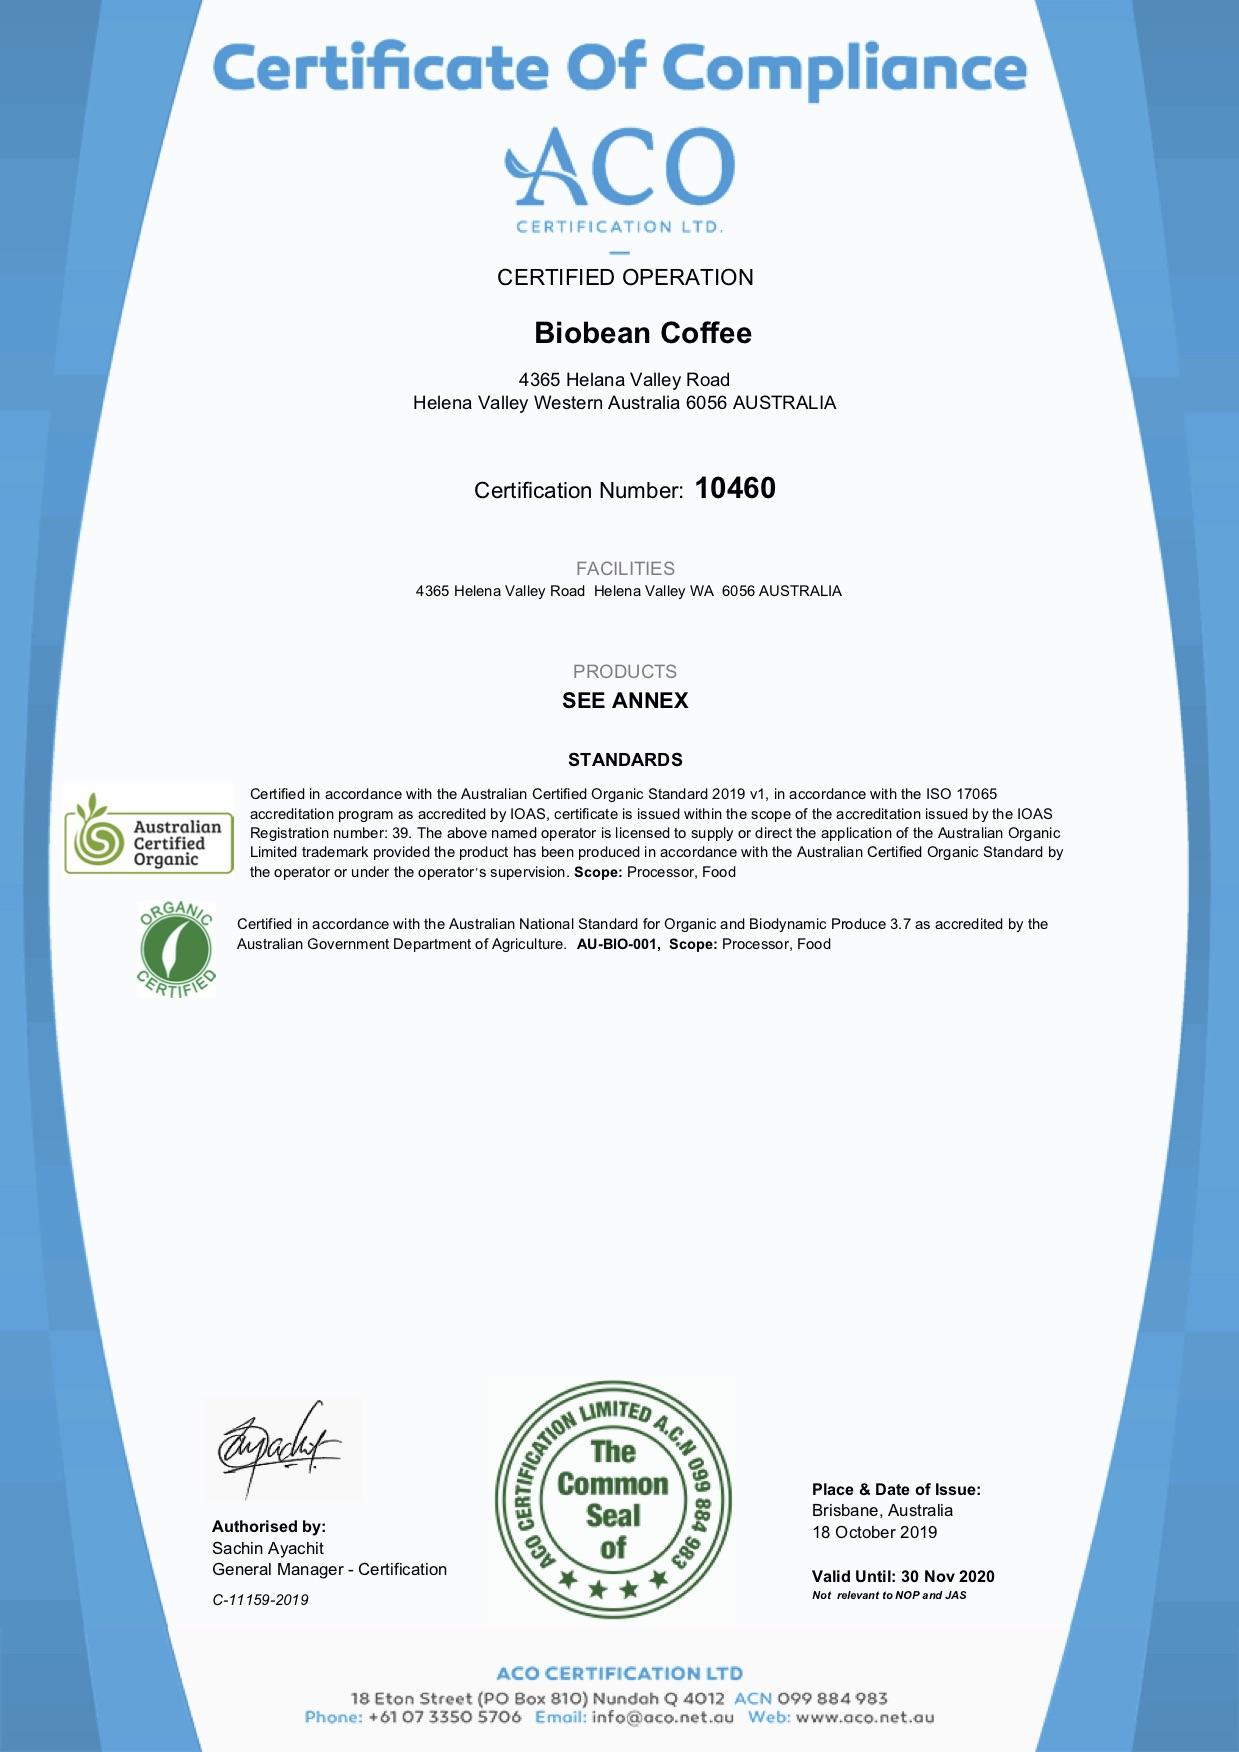 ACO 2020 certificate